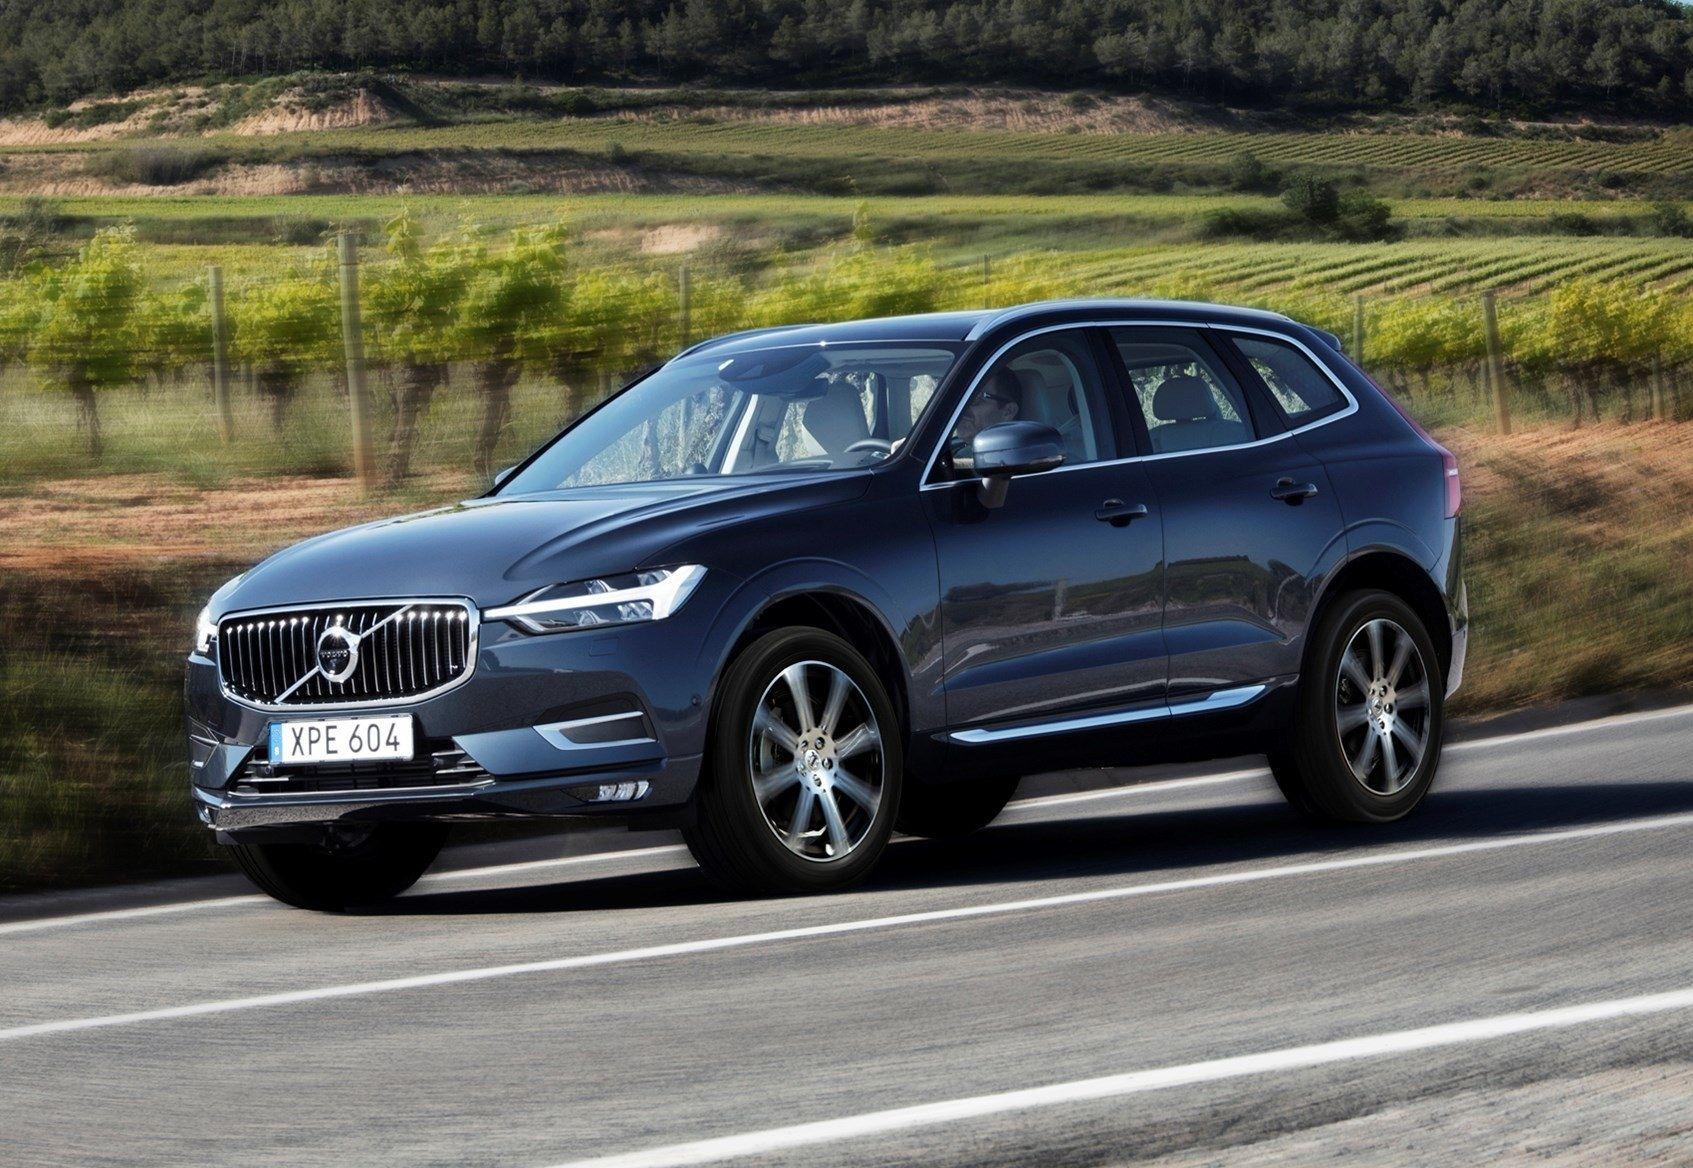 Volvo Xc60 Review Spy Shoot Volvo xc60, Volvo, New cars